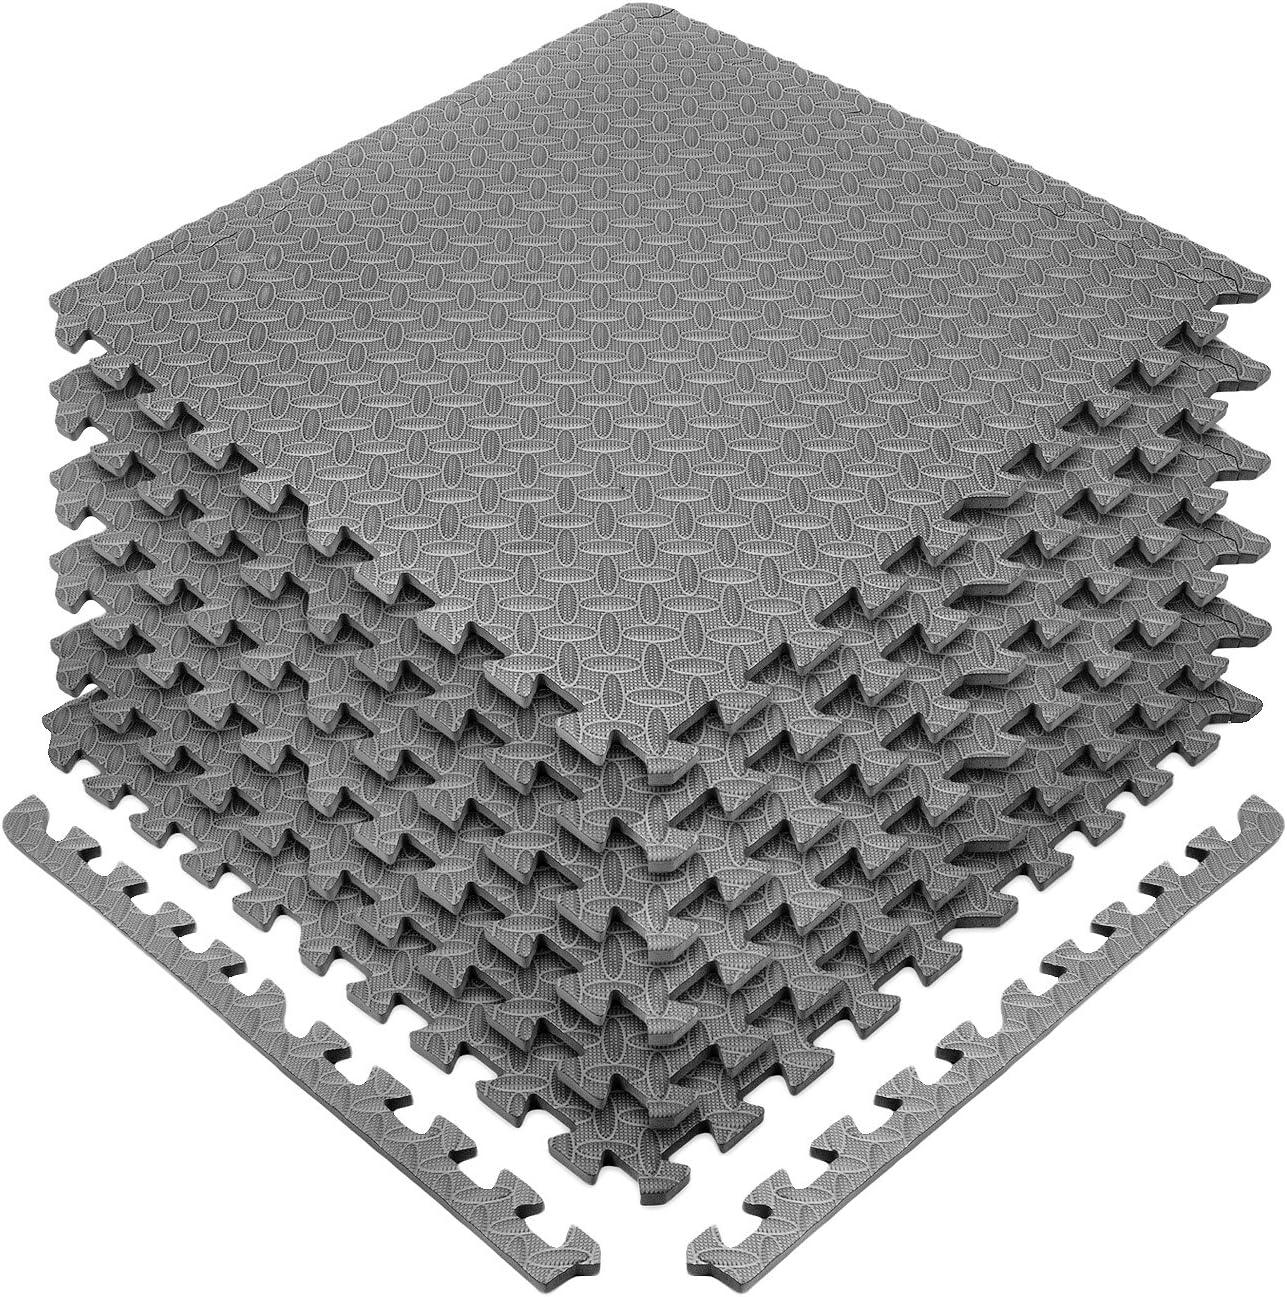 Sivan Health and Fitness Puzzle Exercise Mat EVA Foam Interlocking Tiles